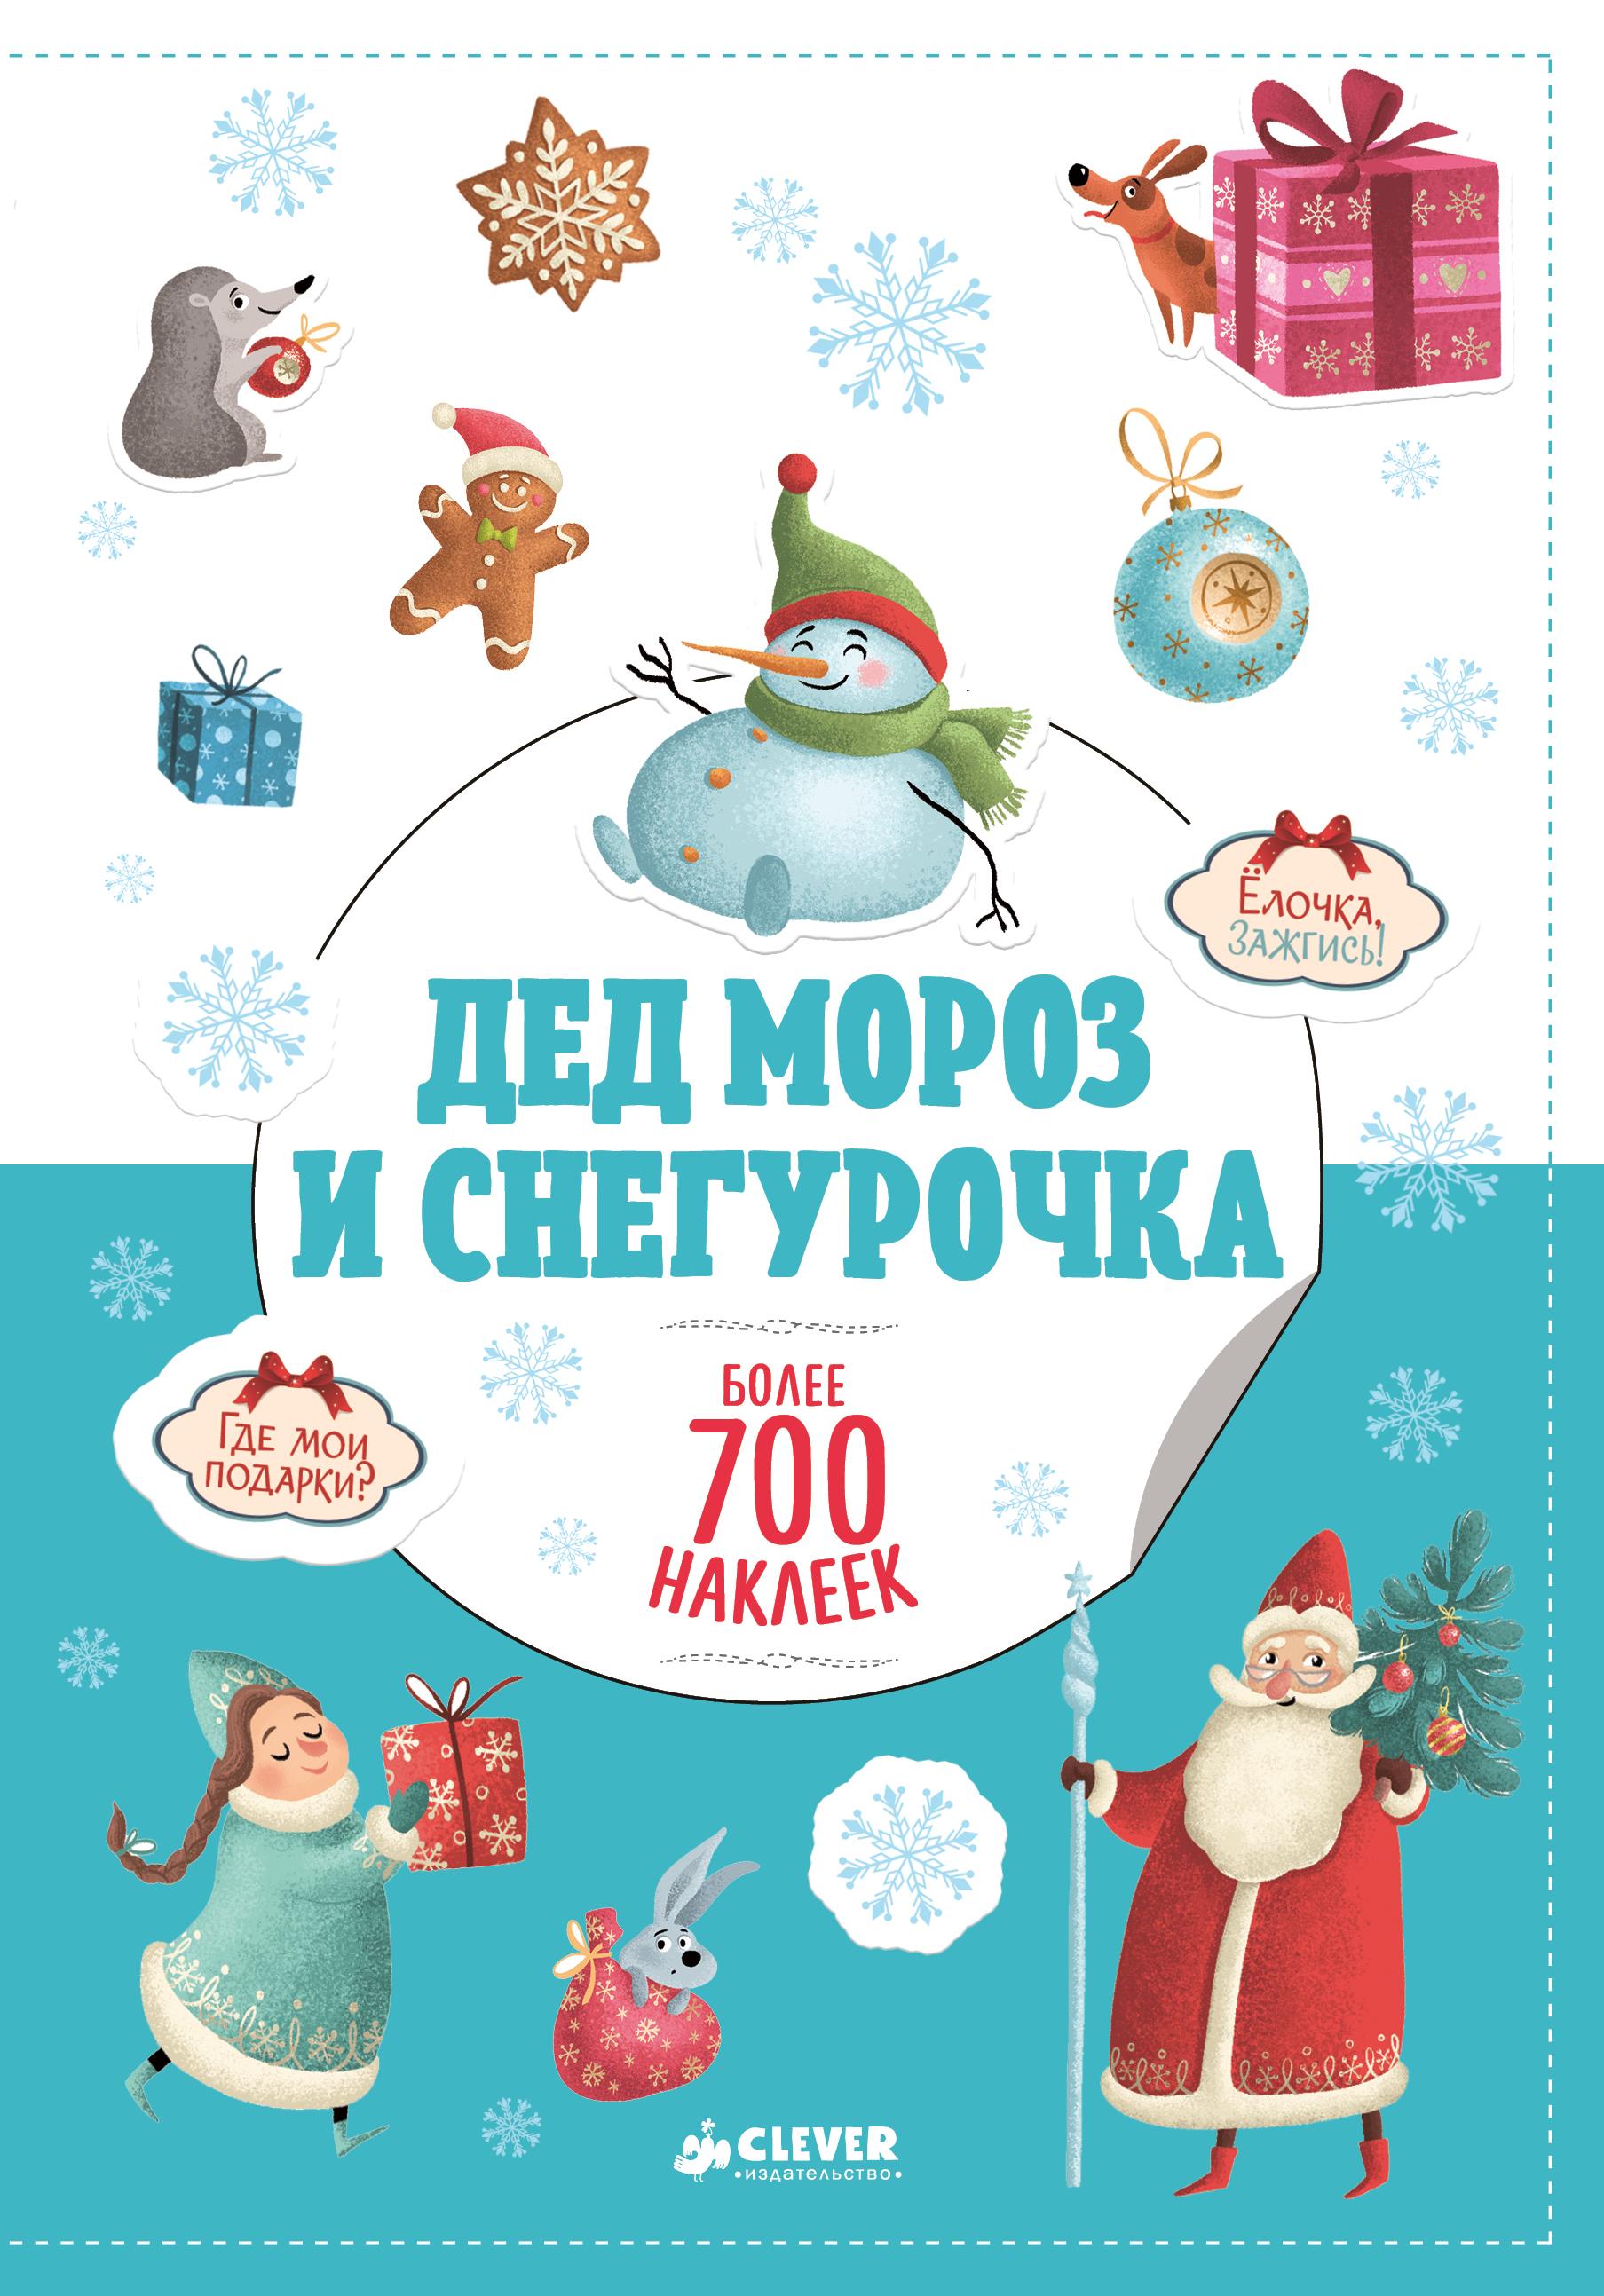 Дед Мороз и Снегурочка 0497 НГ, ПпЕ